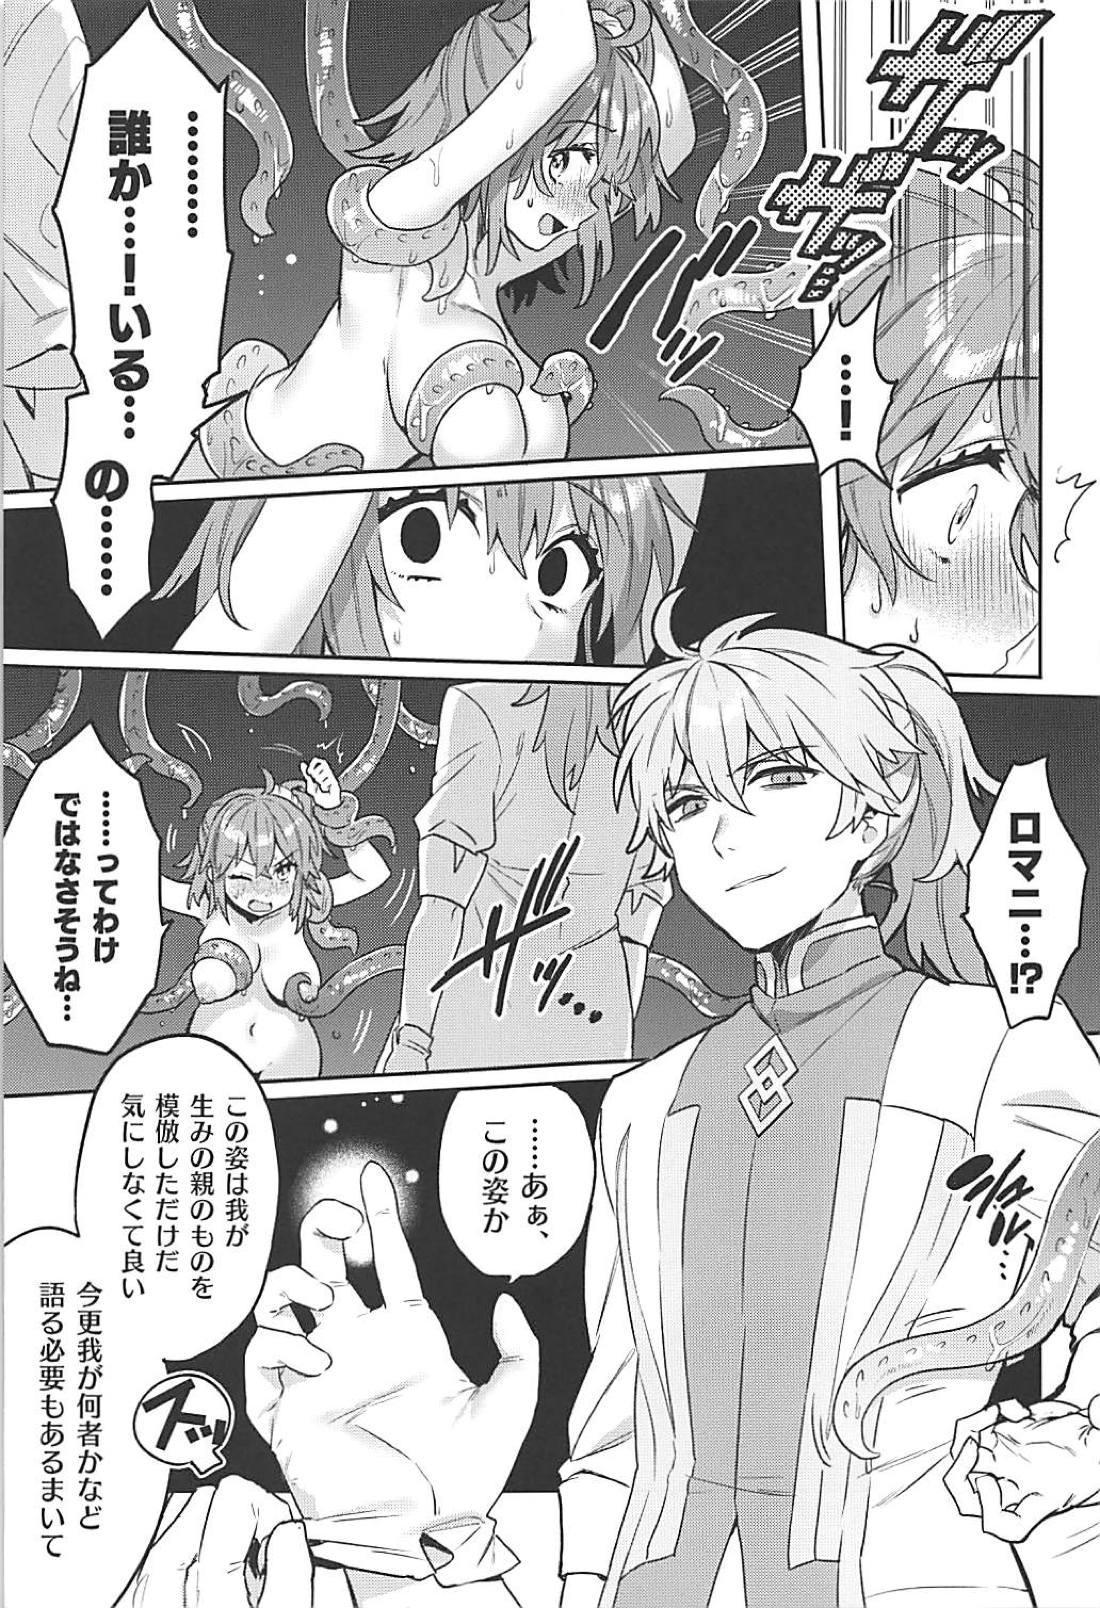 Sennou Inmon Kangoku MA/STER 7